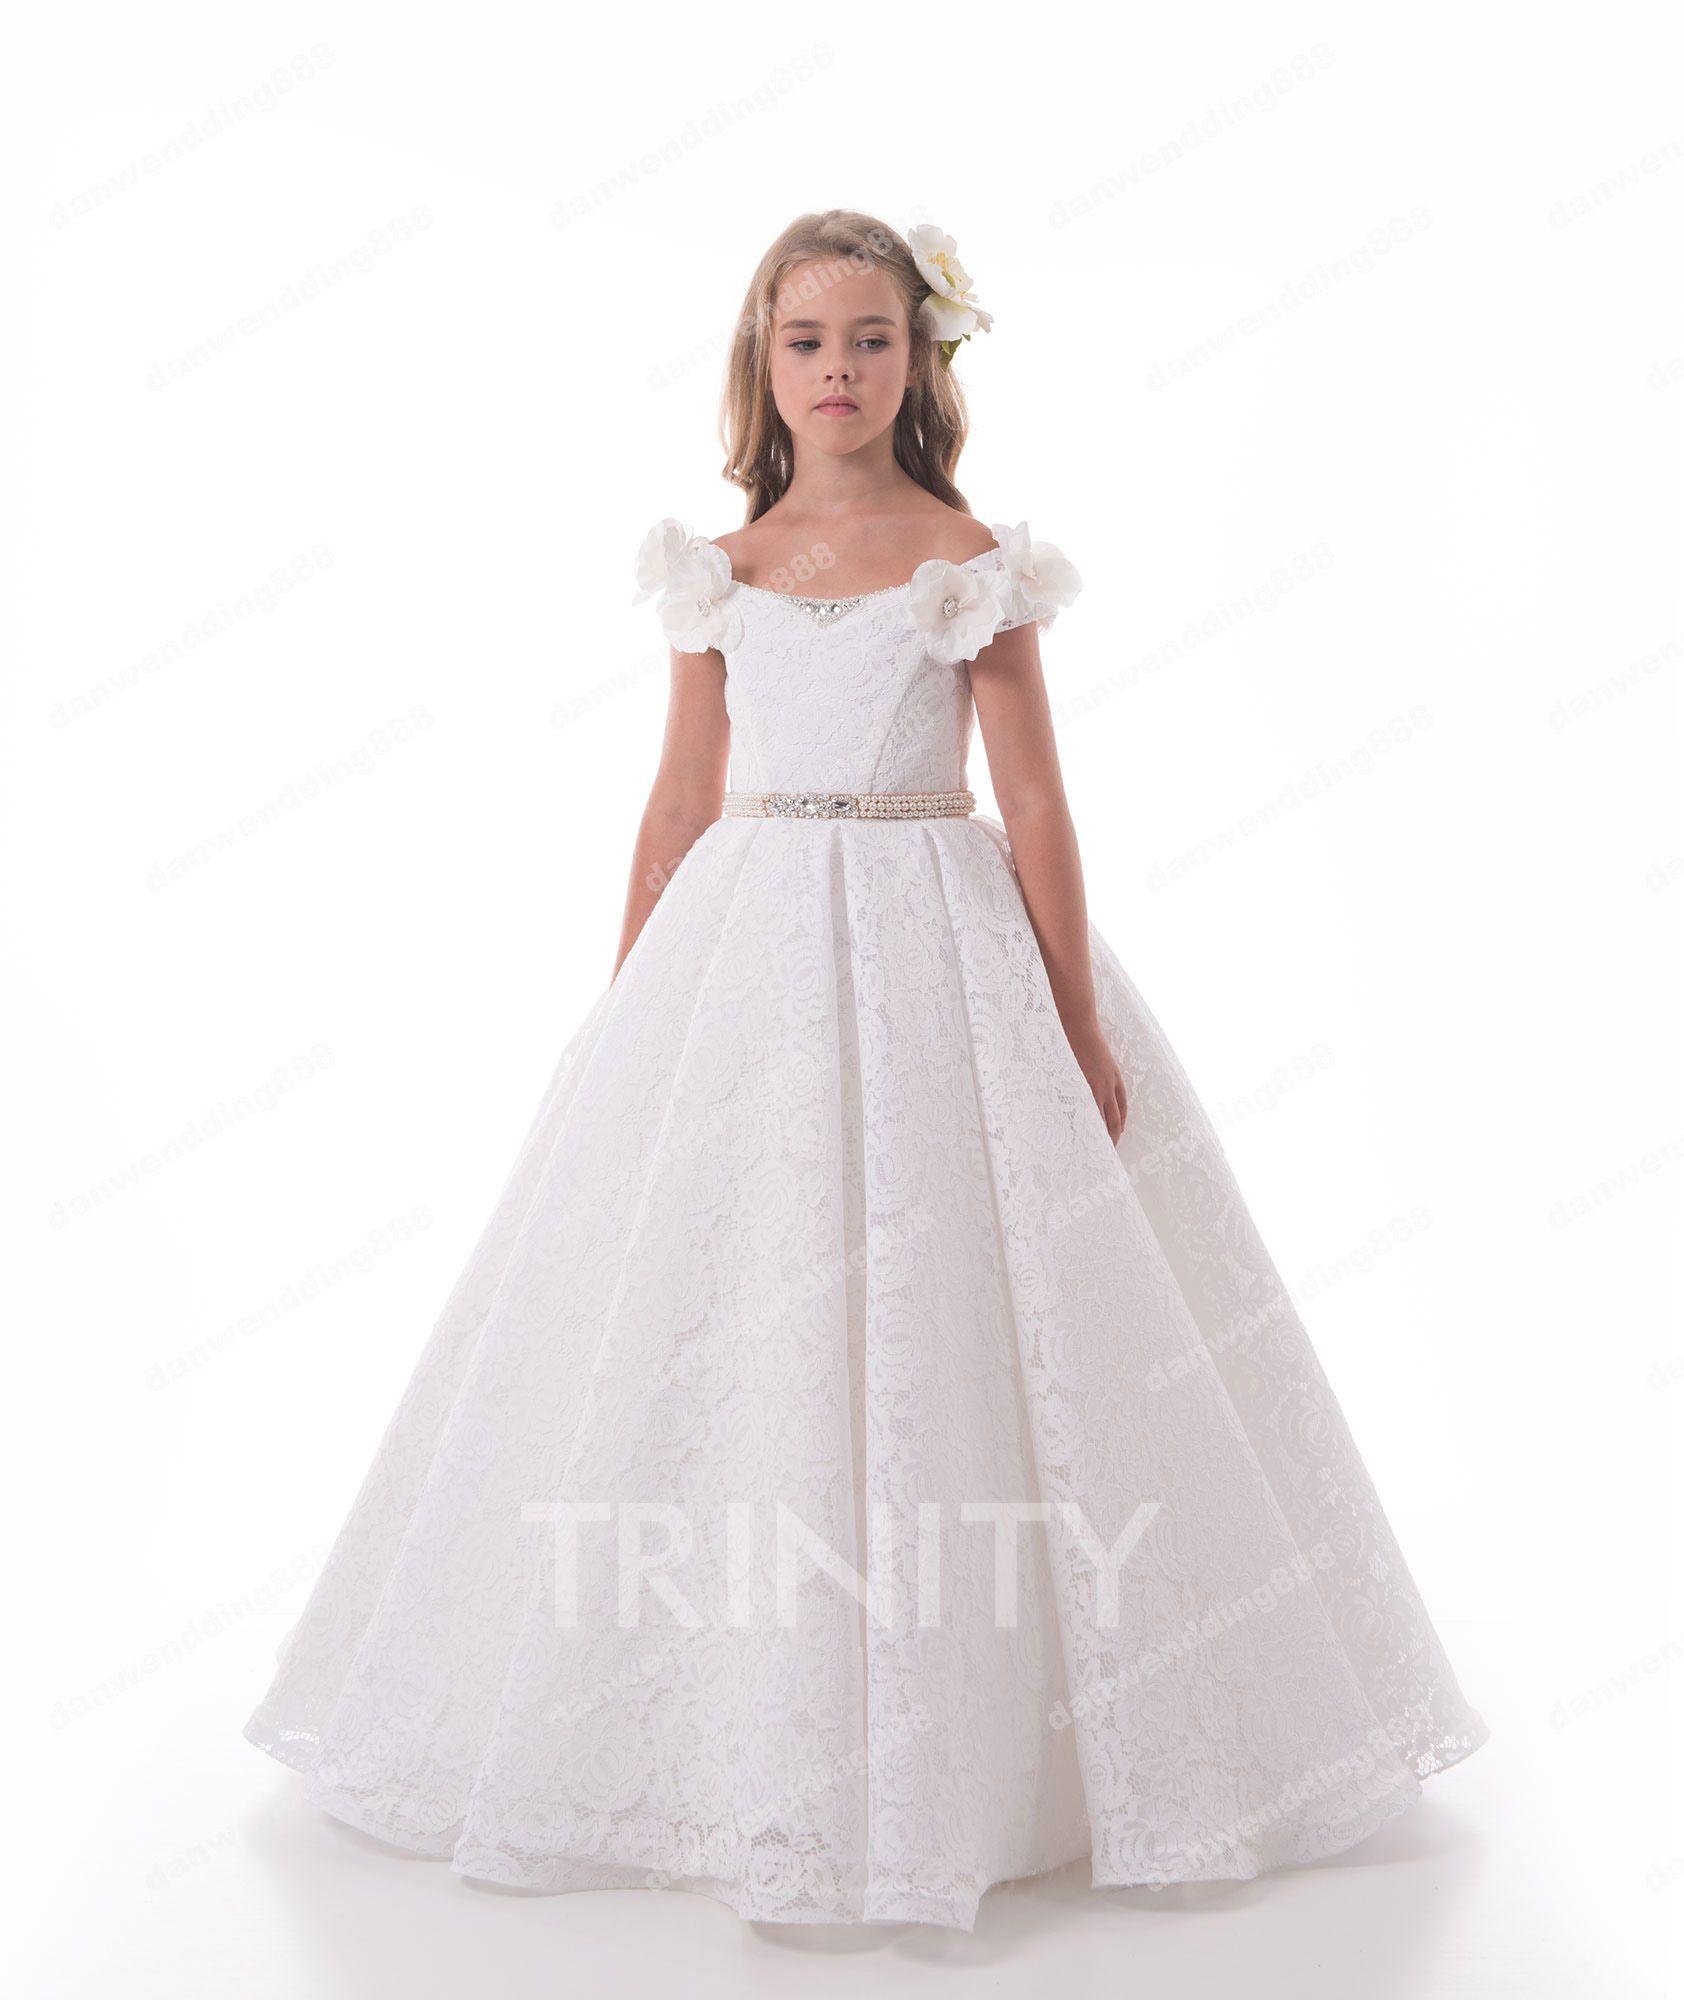 73b9330d5 Beauty White Lace Scoop Sash Flower Girl Dresses Princess Dresses ...